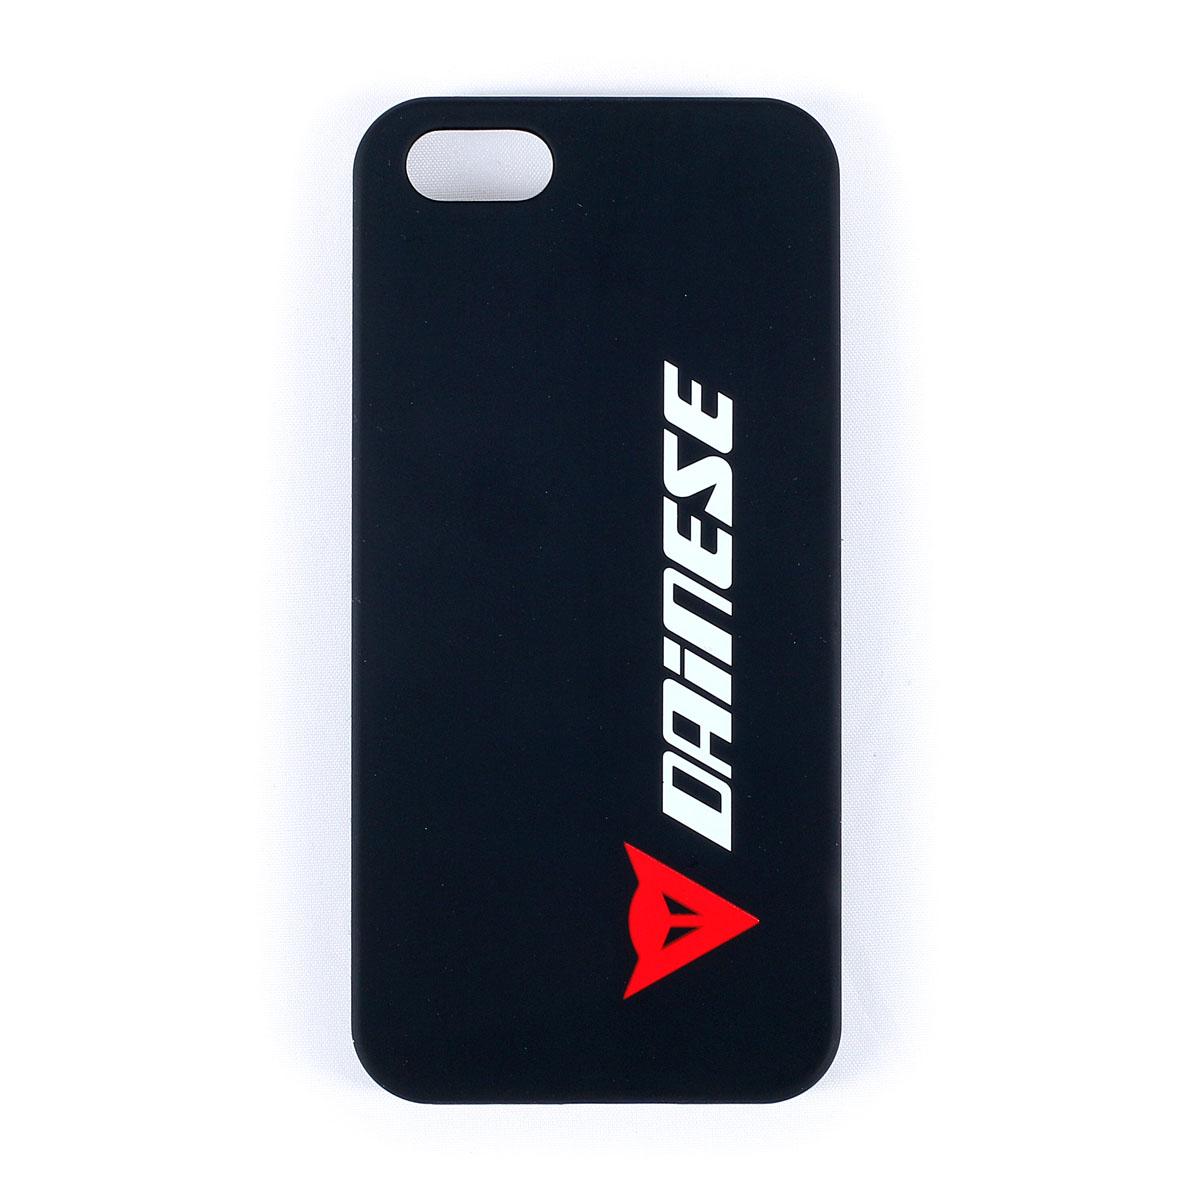 Cover per IPHONE 5-5S Dainese nero